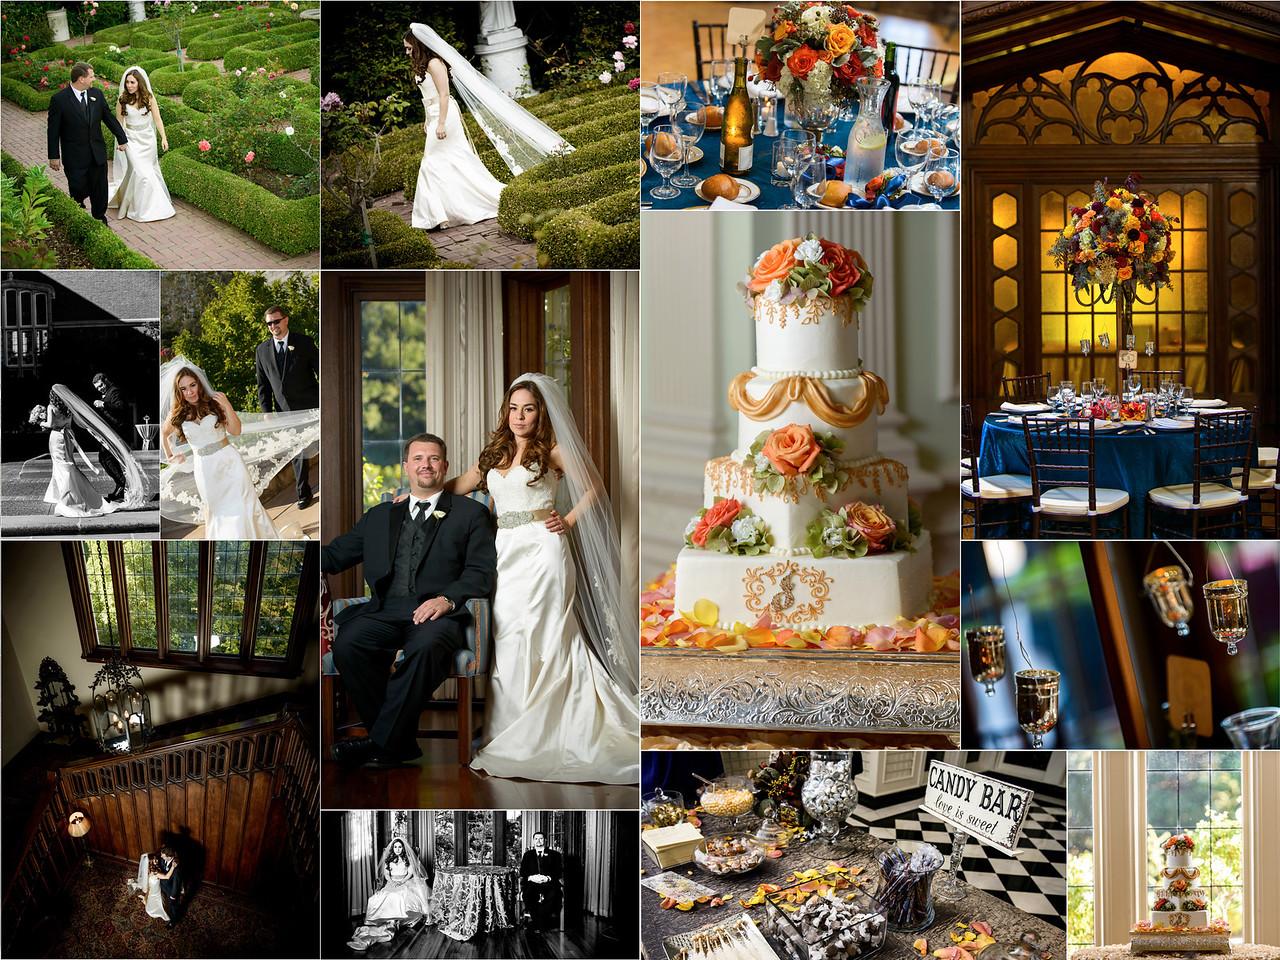 Danielle_and_Tony_Wedding_Photography_4x6_Photo_Board_04